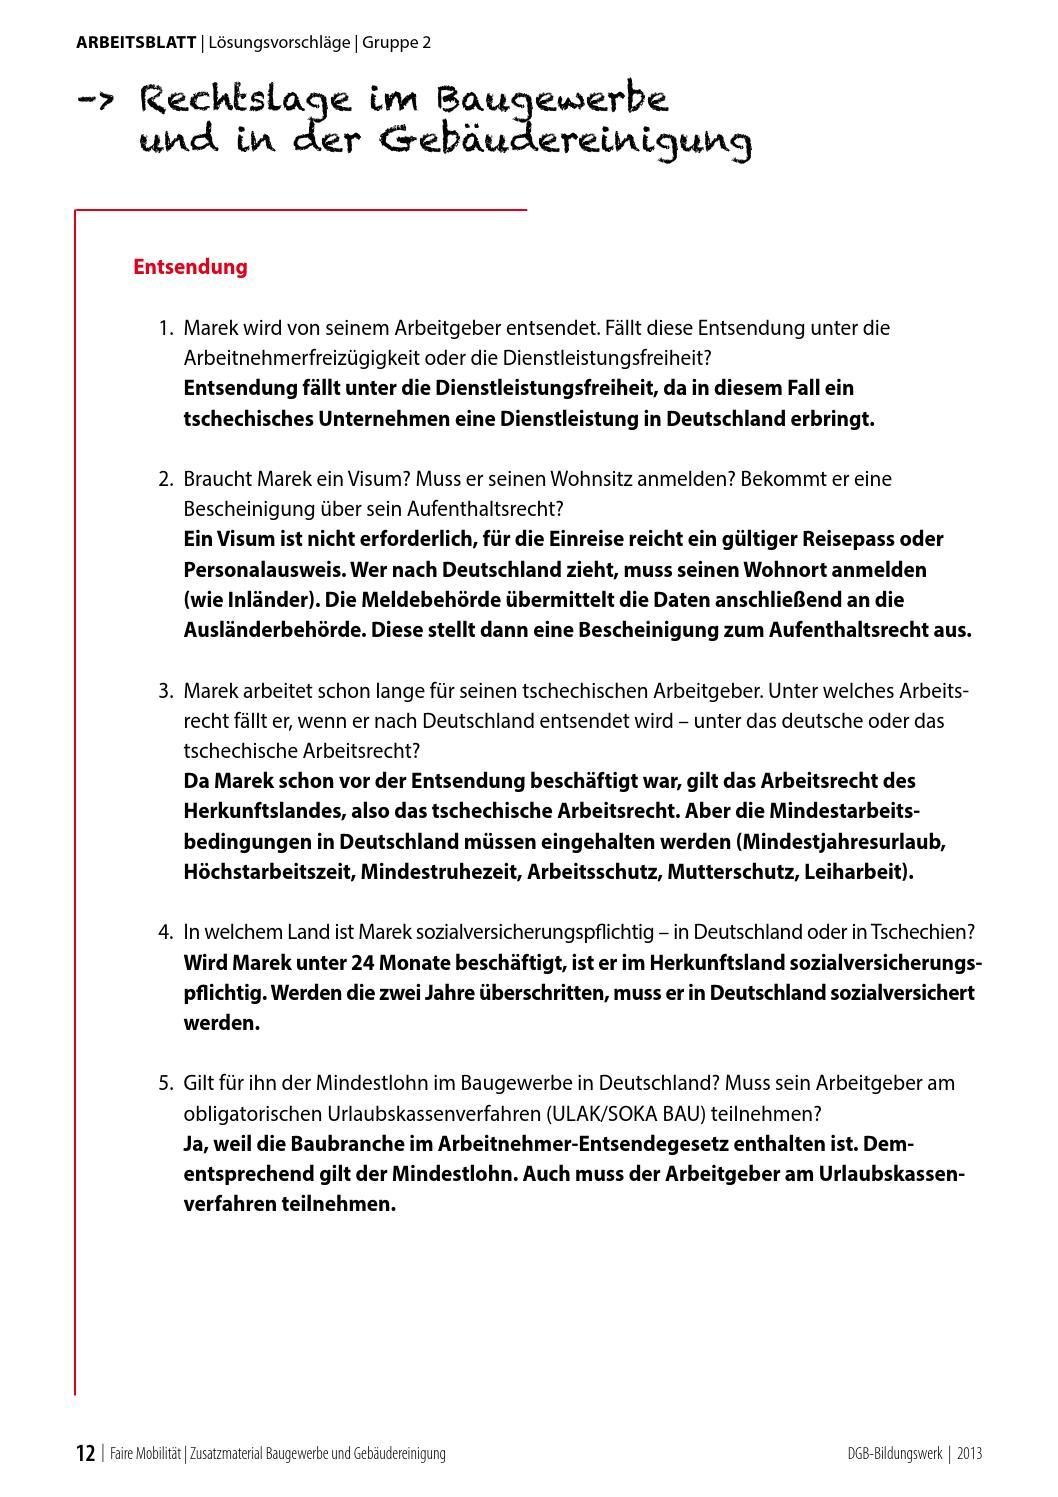 Fantastisch Kunstsprache Arbeitsblatt Für Schüler Ideen - Super ...